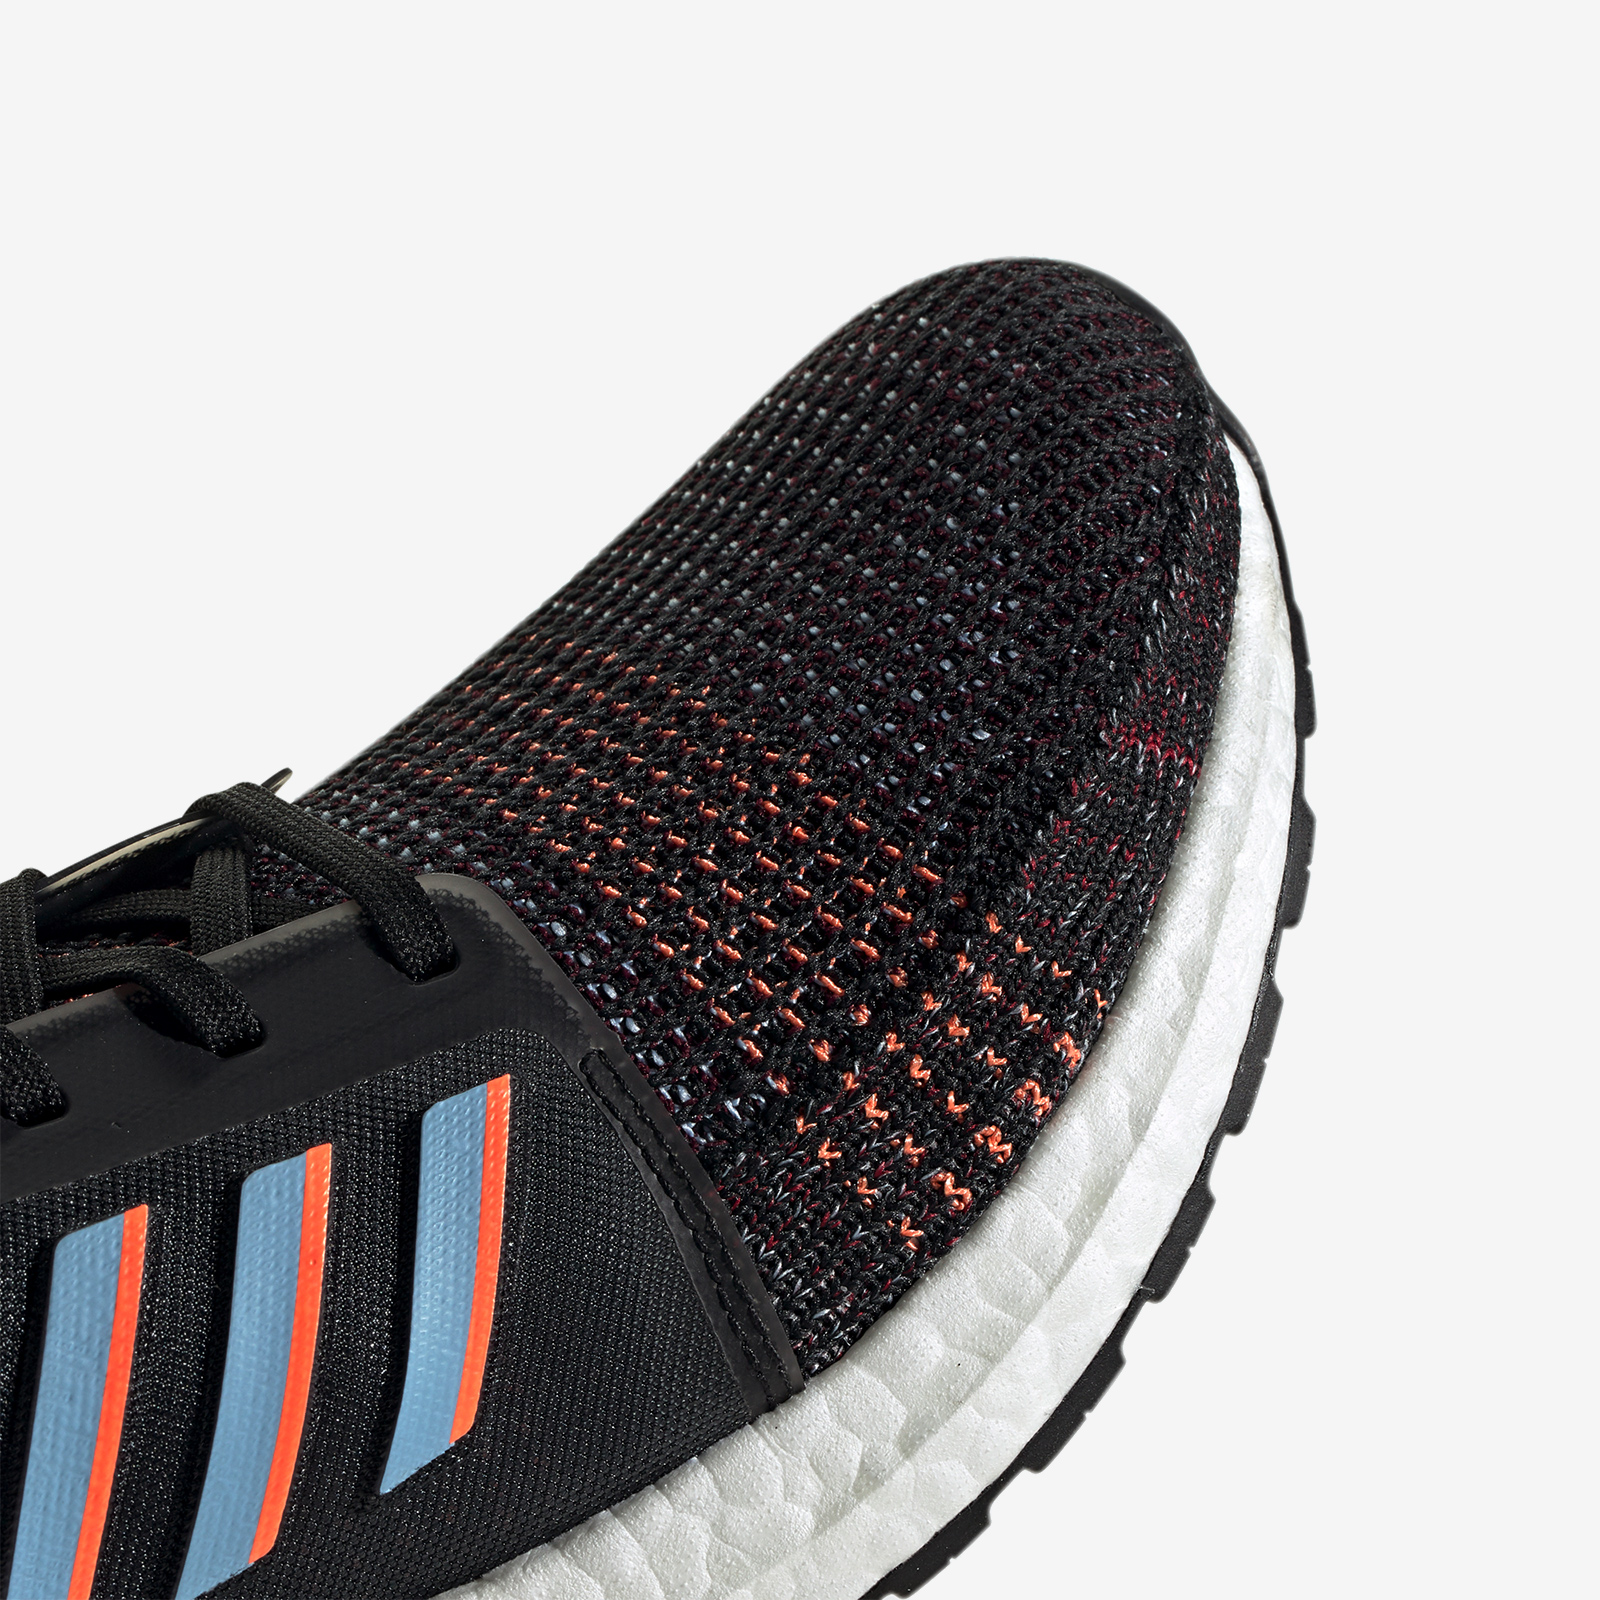 adidas Ultraboost 19 G54011 Sneakersnstuff | 1999年創業